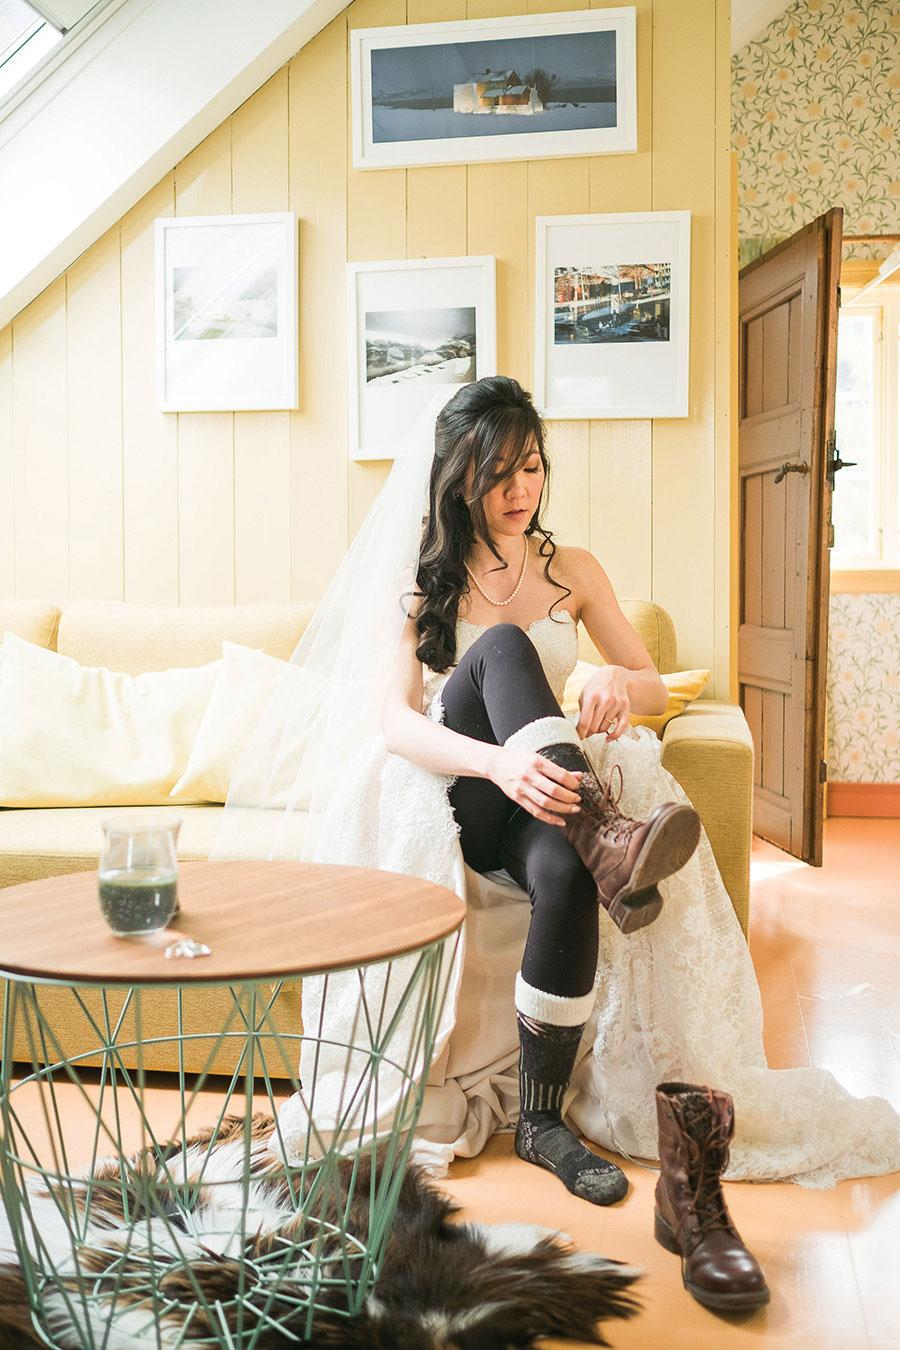 breathtaking-scenic-wedding-in-norway20160914_0104